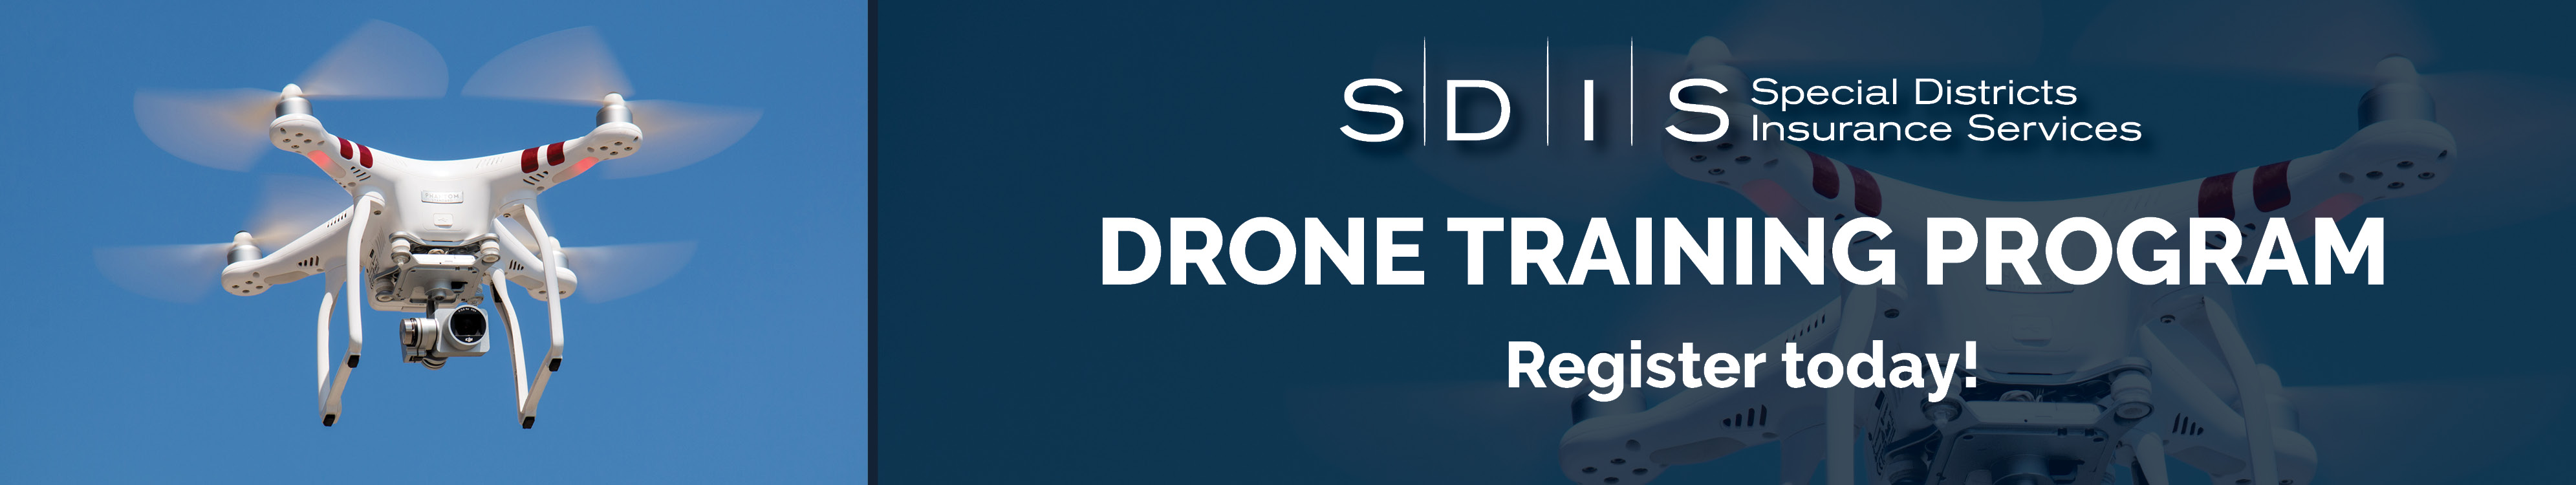 2019 SDIS Drone Training Program